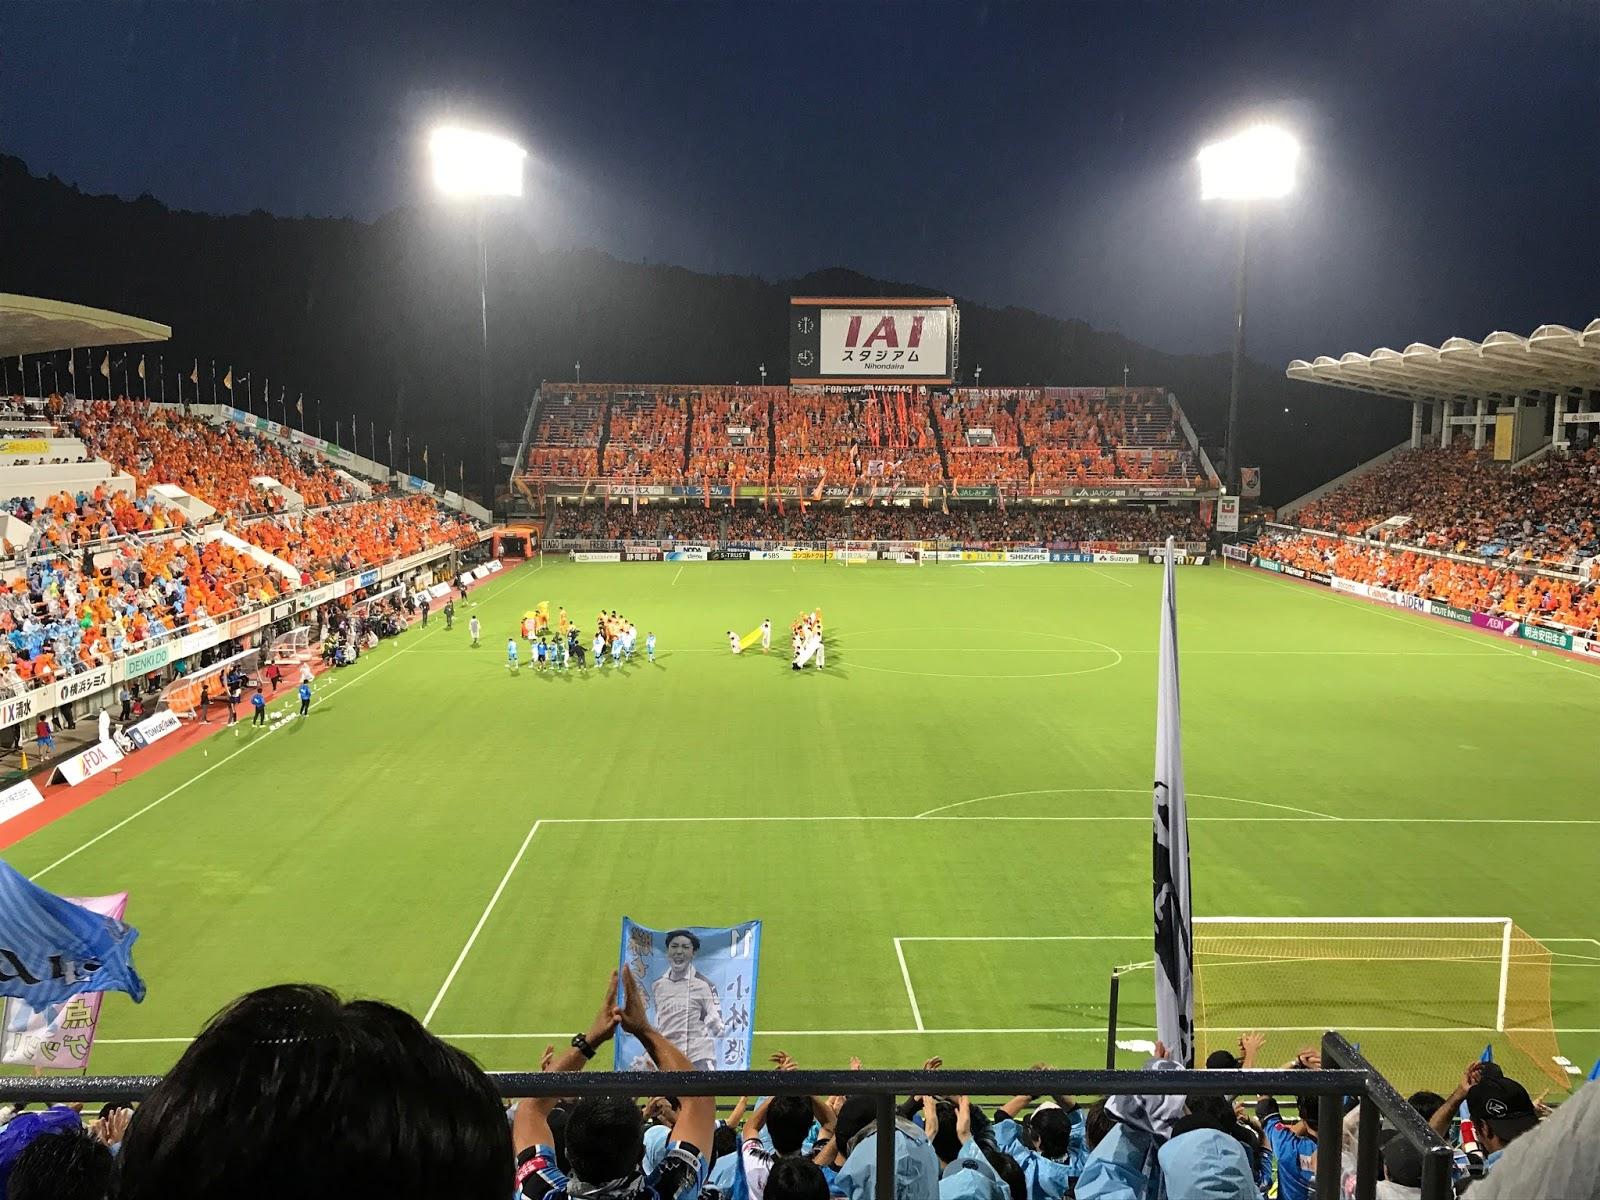 Frontale Rabbit 川崎フロンターレ Vs Shimizu S Pulse Away 16 9 17 J League Match 26